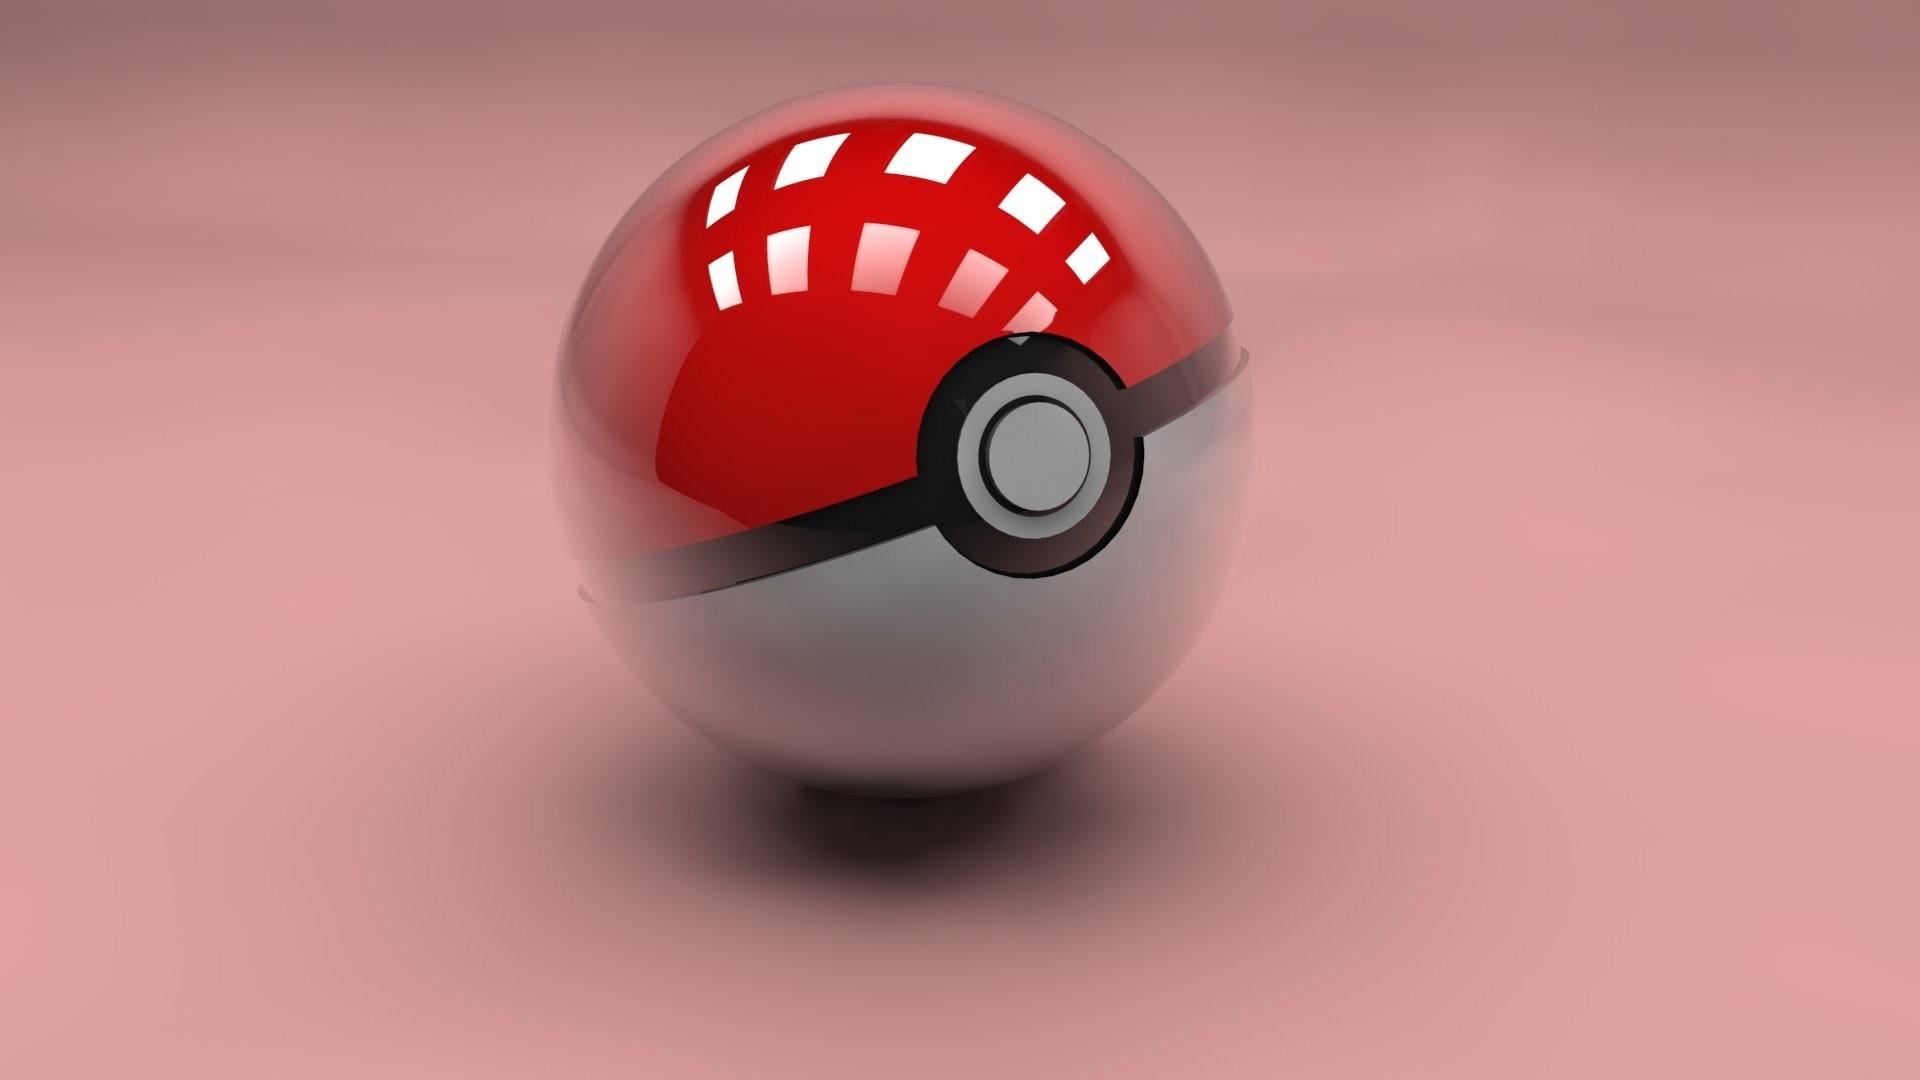 Res: 1920x1080, Pokeball Wallpaper Speedart Subs Special Hd Pokemon Ball For Pc High  Resolution